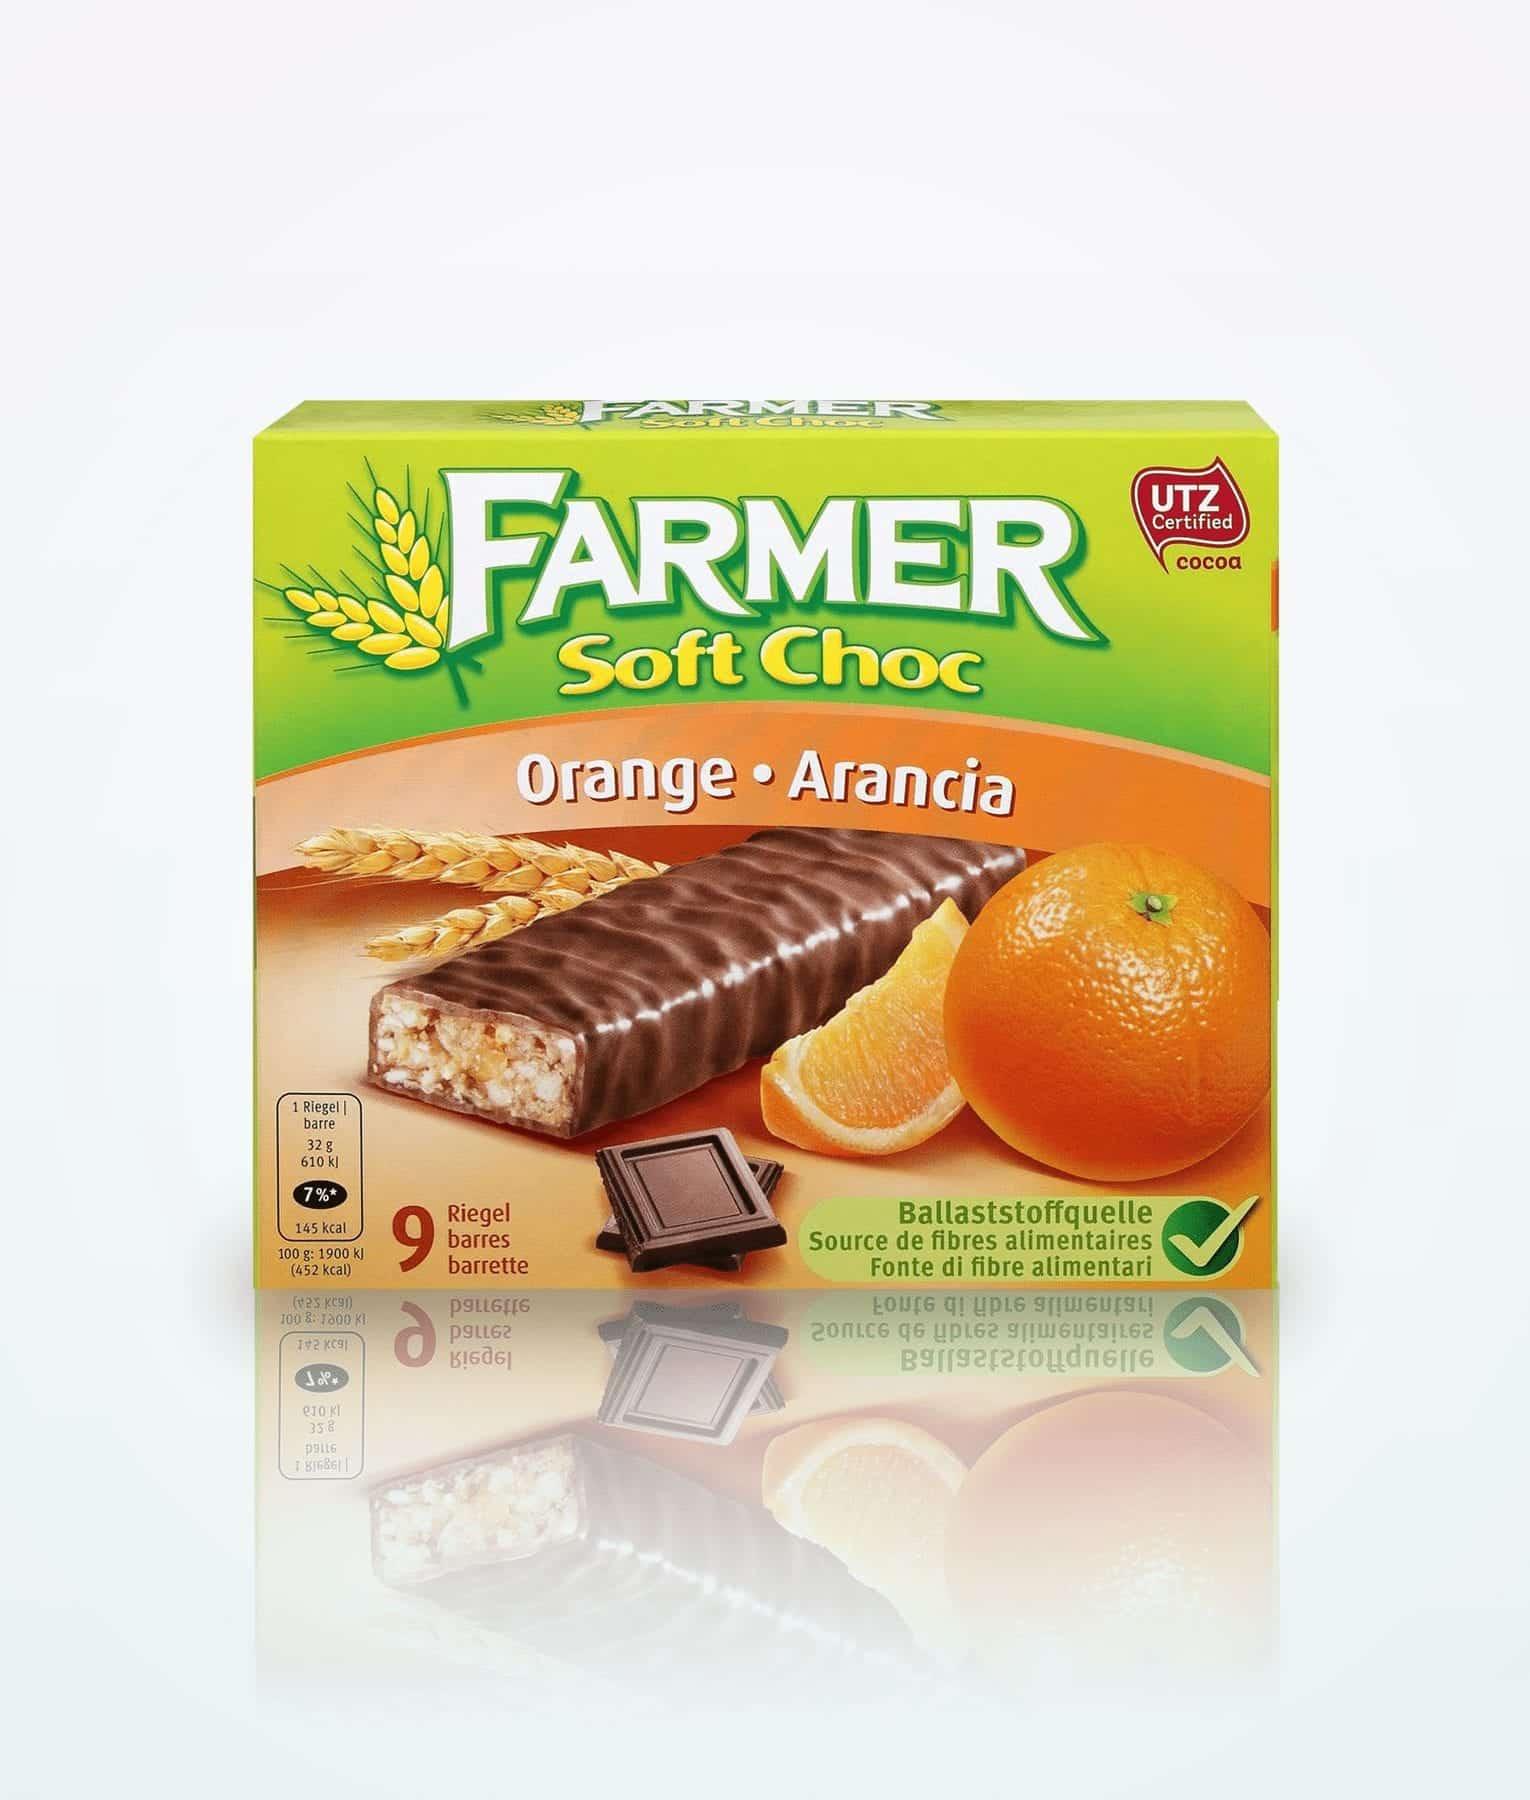 farmer-9-soft-choc-with-orange-bars